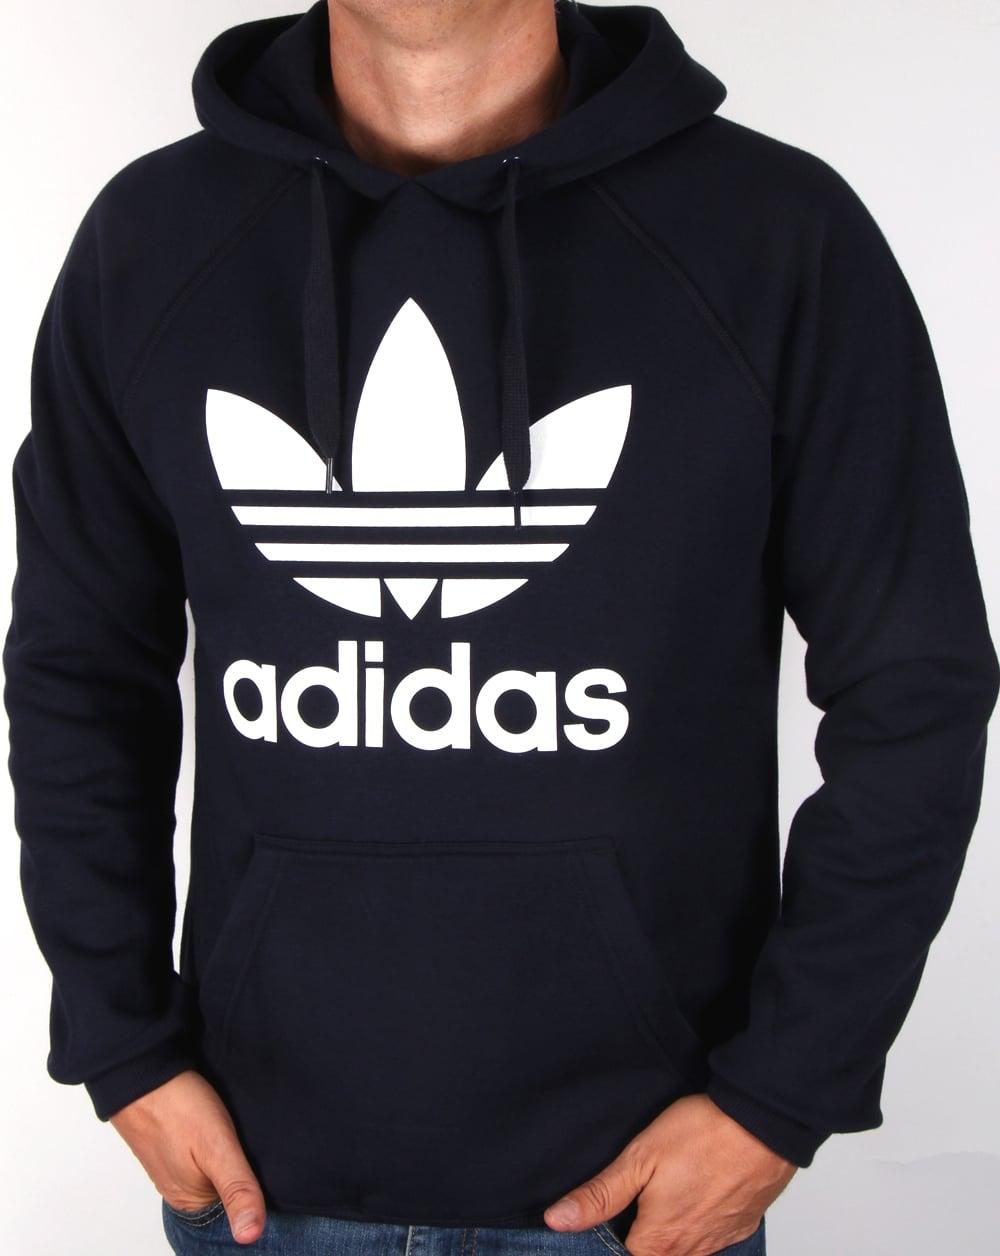 Adidas Ink Hoody Legend Trefoil Originals CsQhrdt